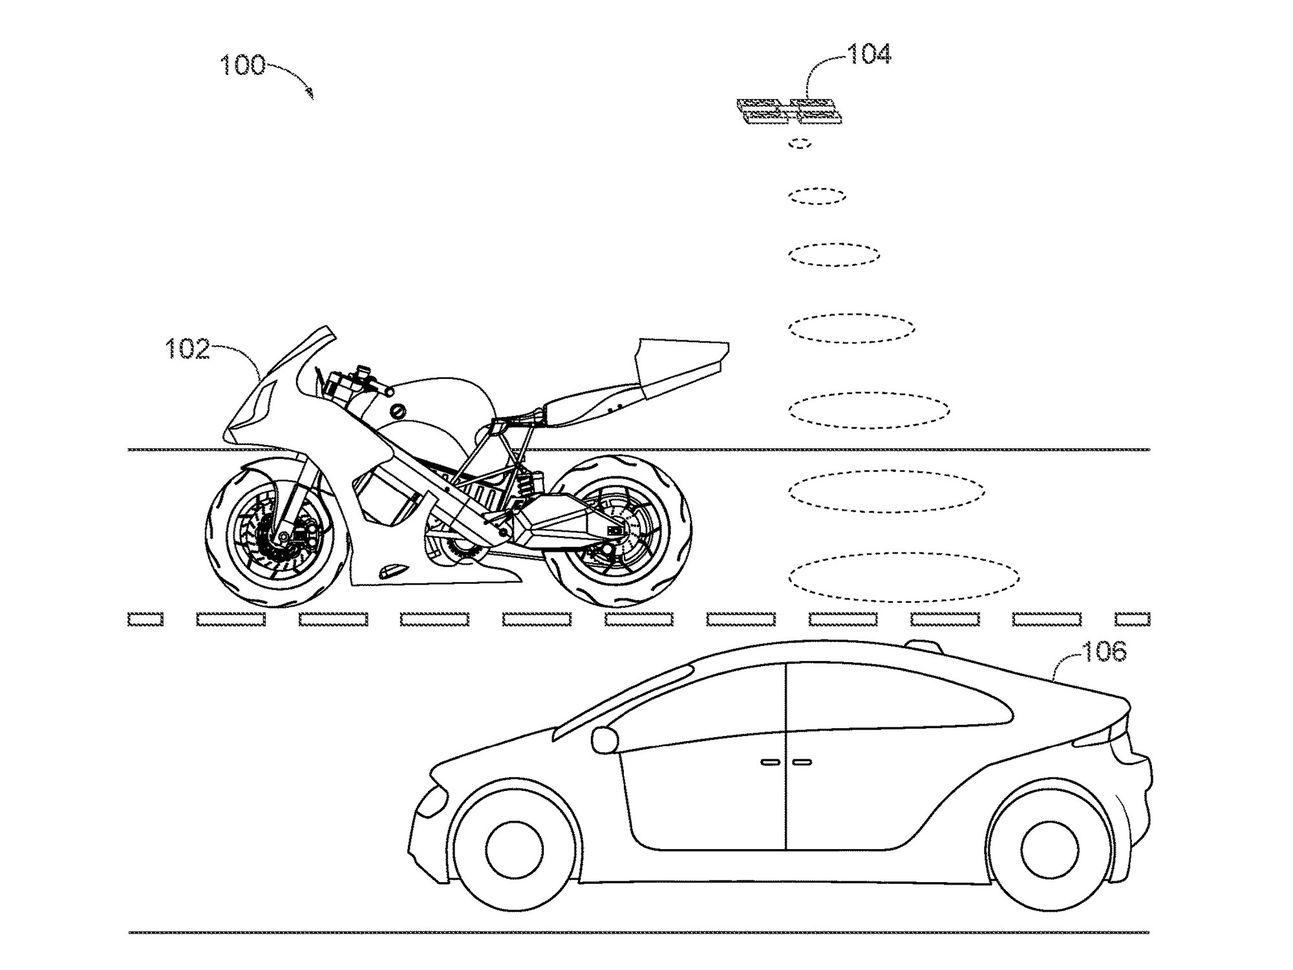 H Honda βάζει ένα drone στο πίσω μέρος μίας μηχανής